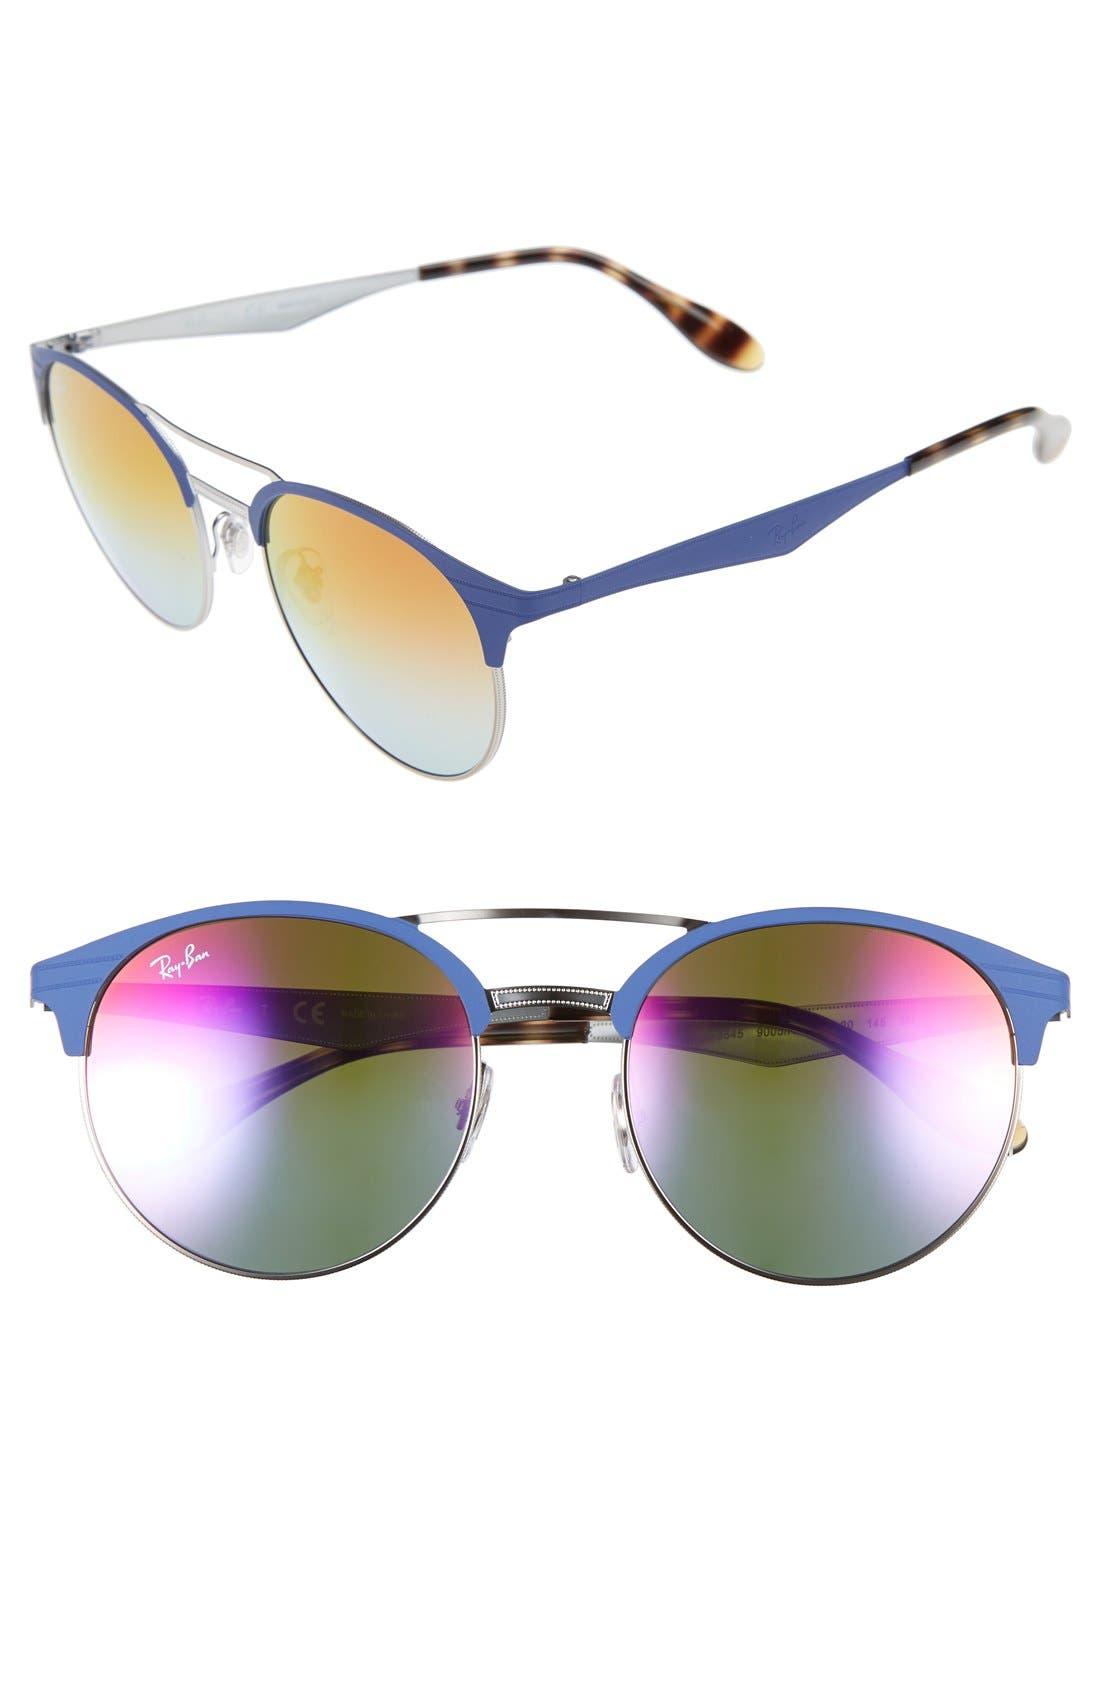 Highstreet 54mm Round Sunglasses,                         Main,                         color, 001